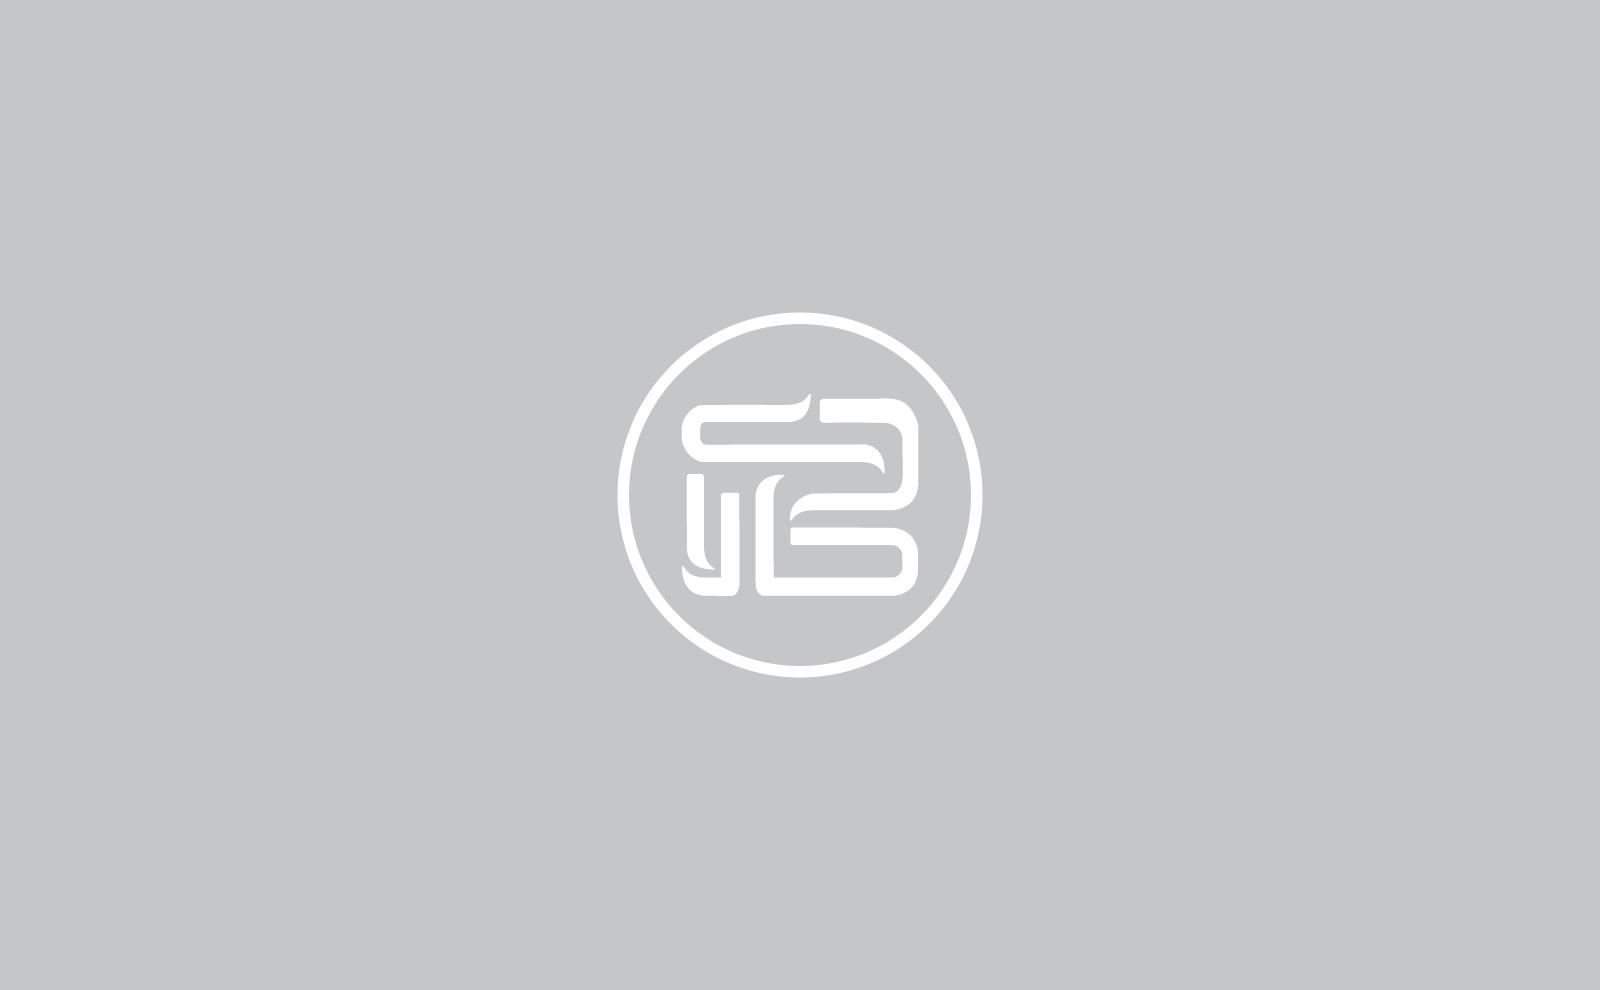 Dsikala- Add 4